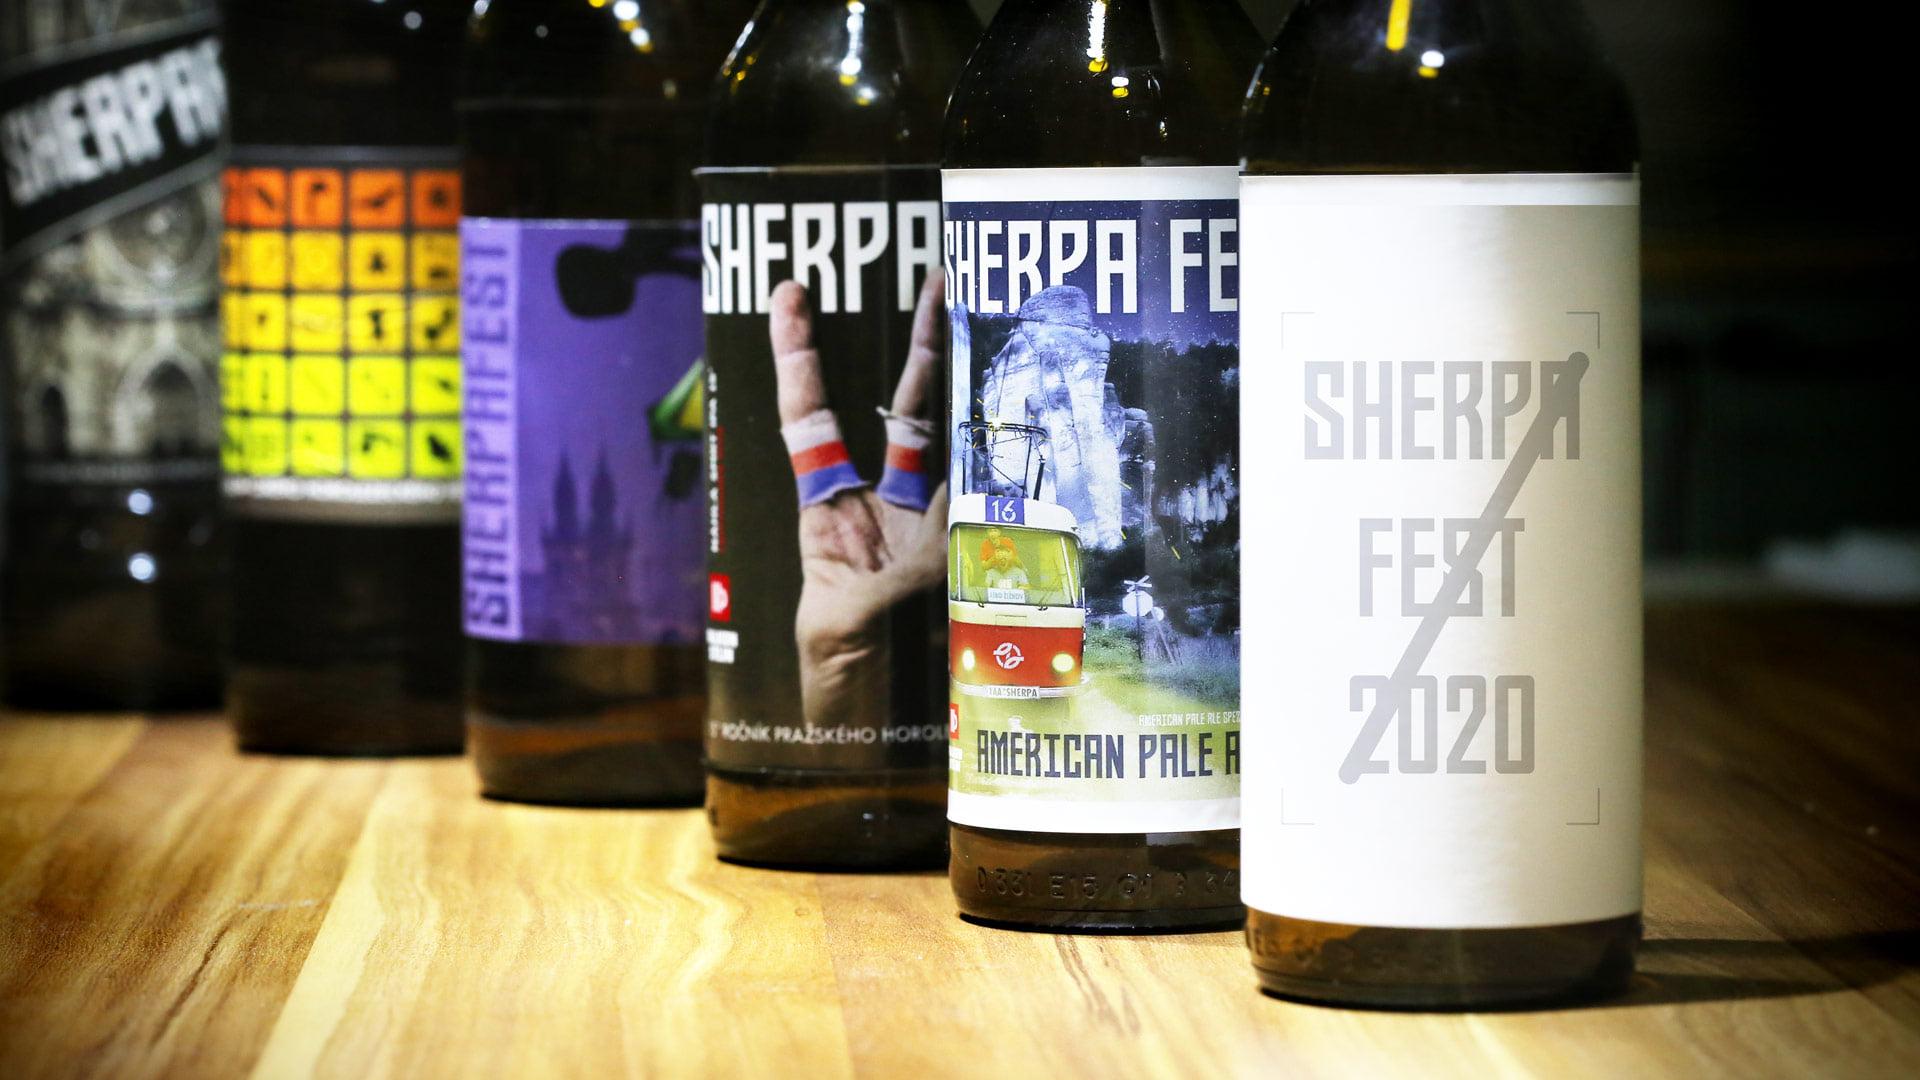 Sherpafest 2020